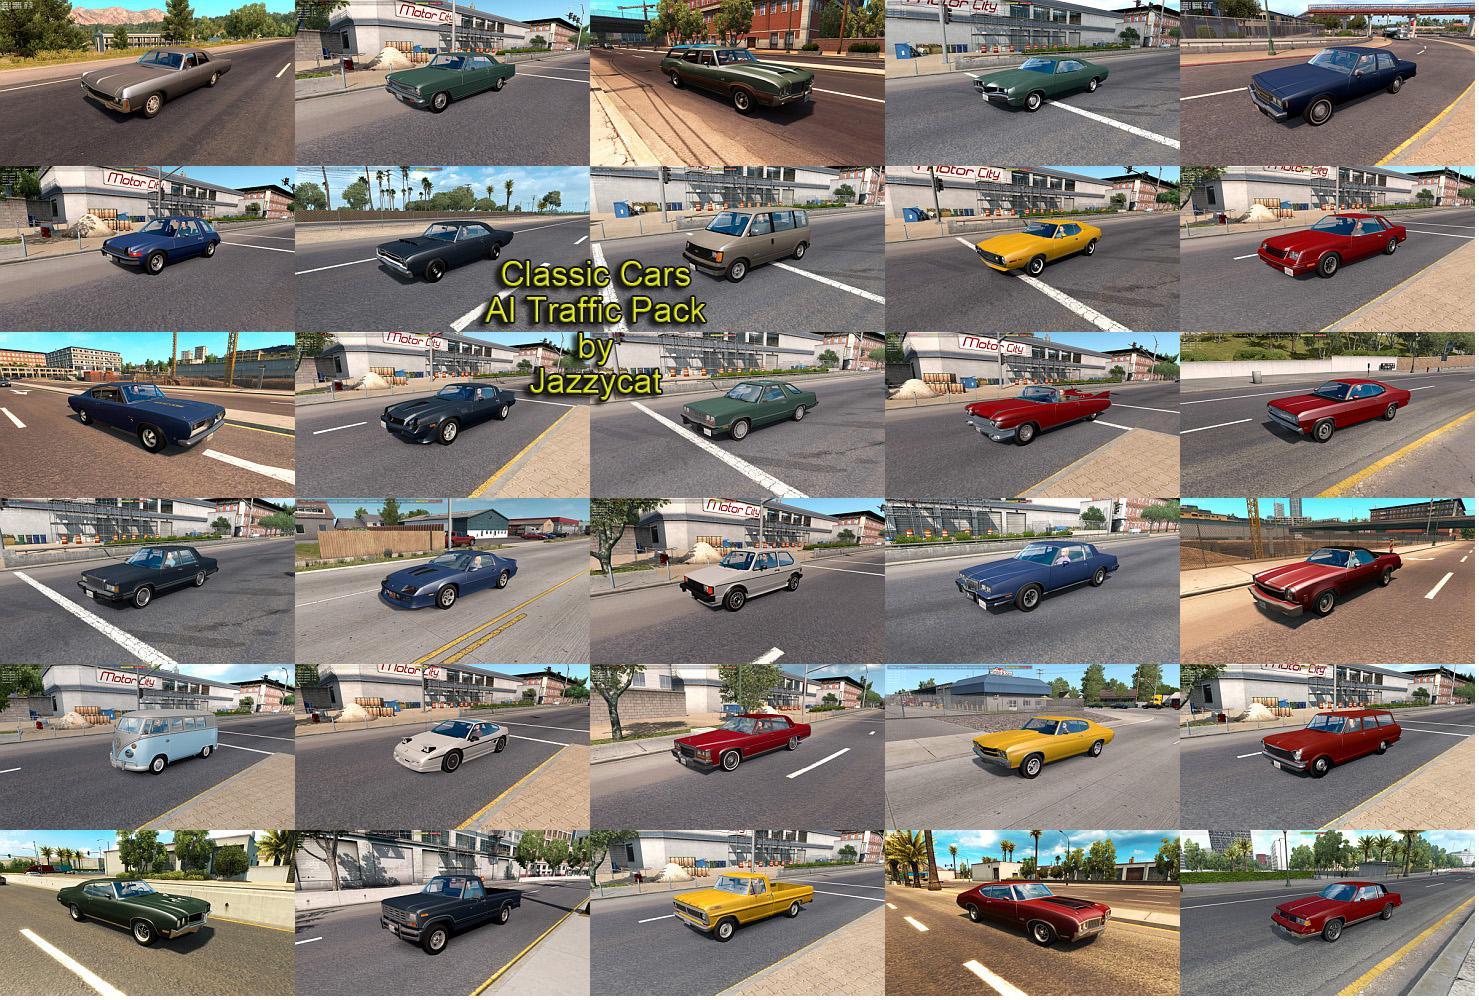 [ATS] Classic Cars in AI Traffic Pack v4.9 (1.36.x) • ATS ...